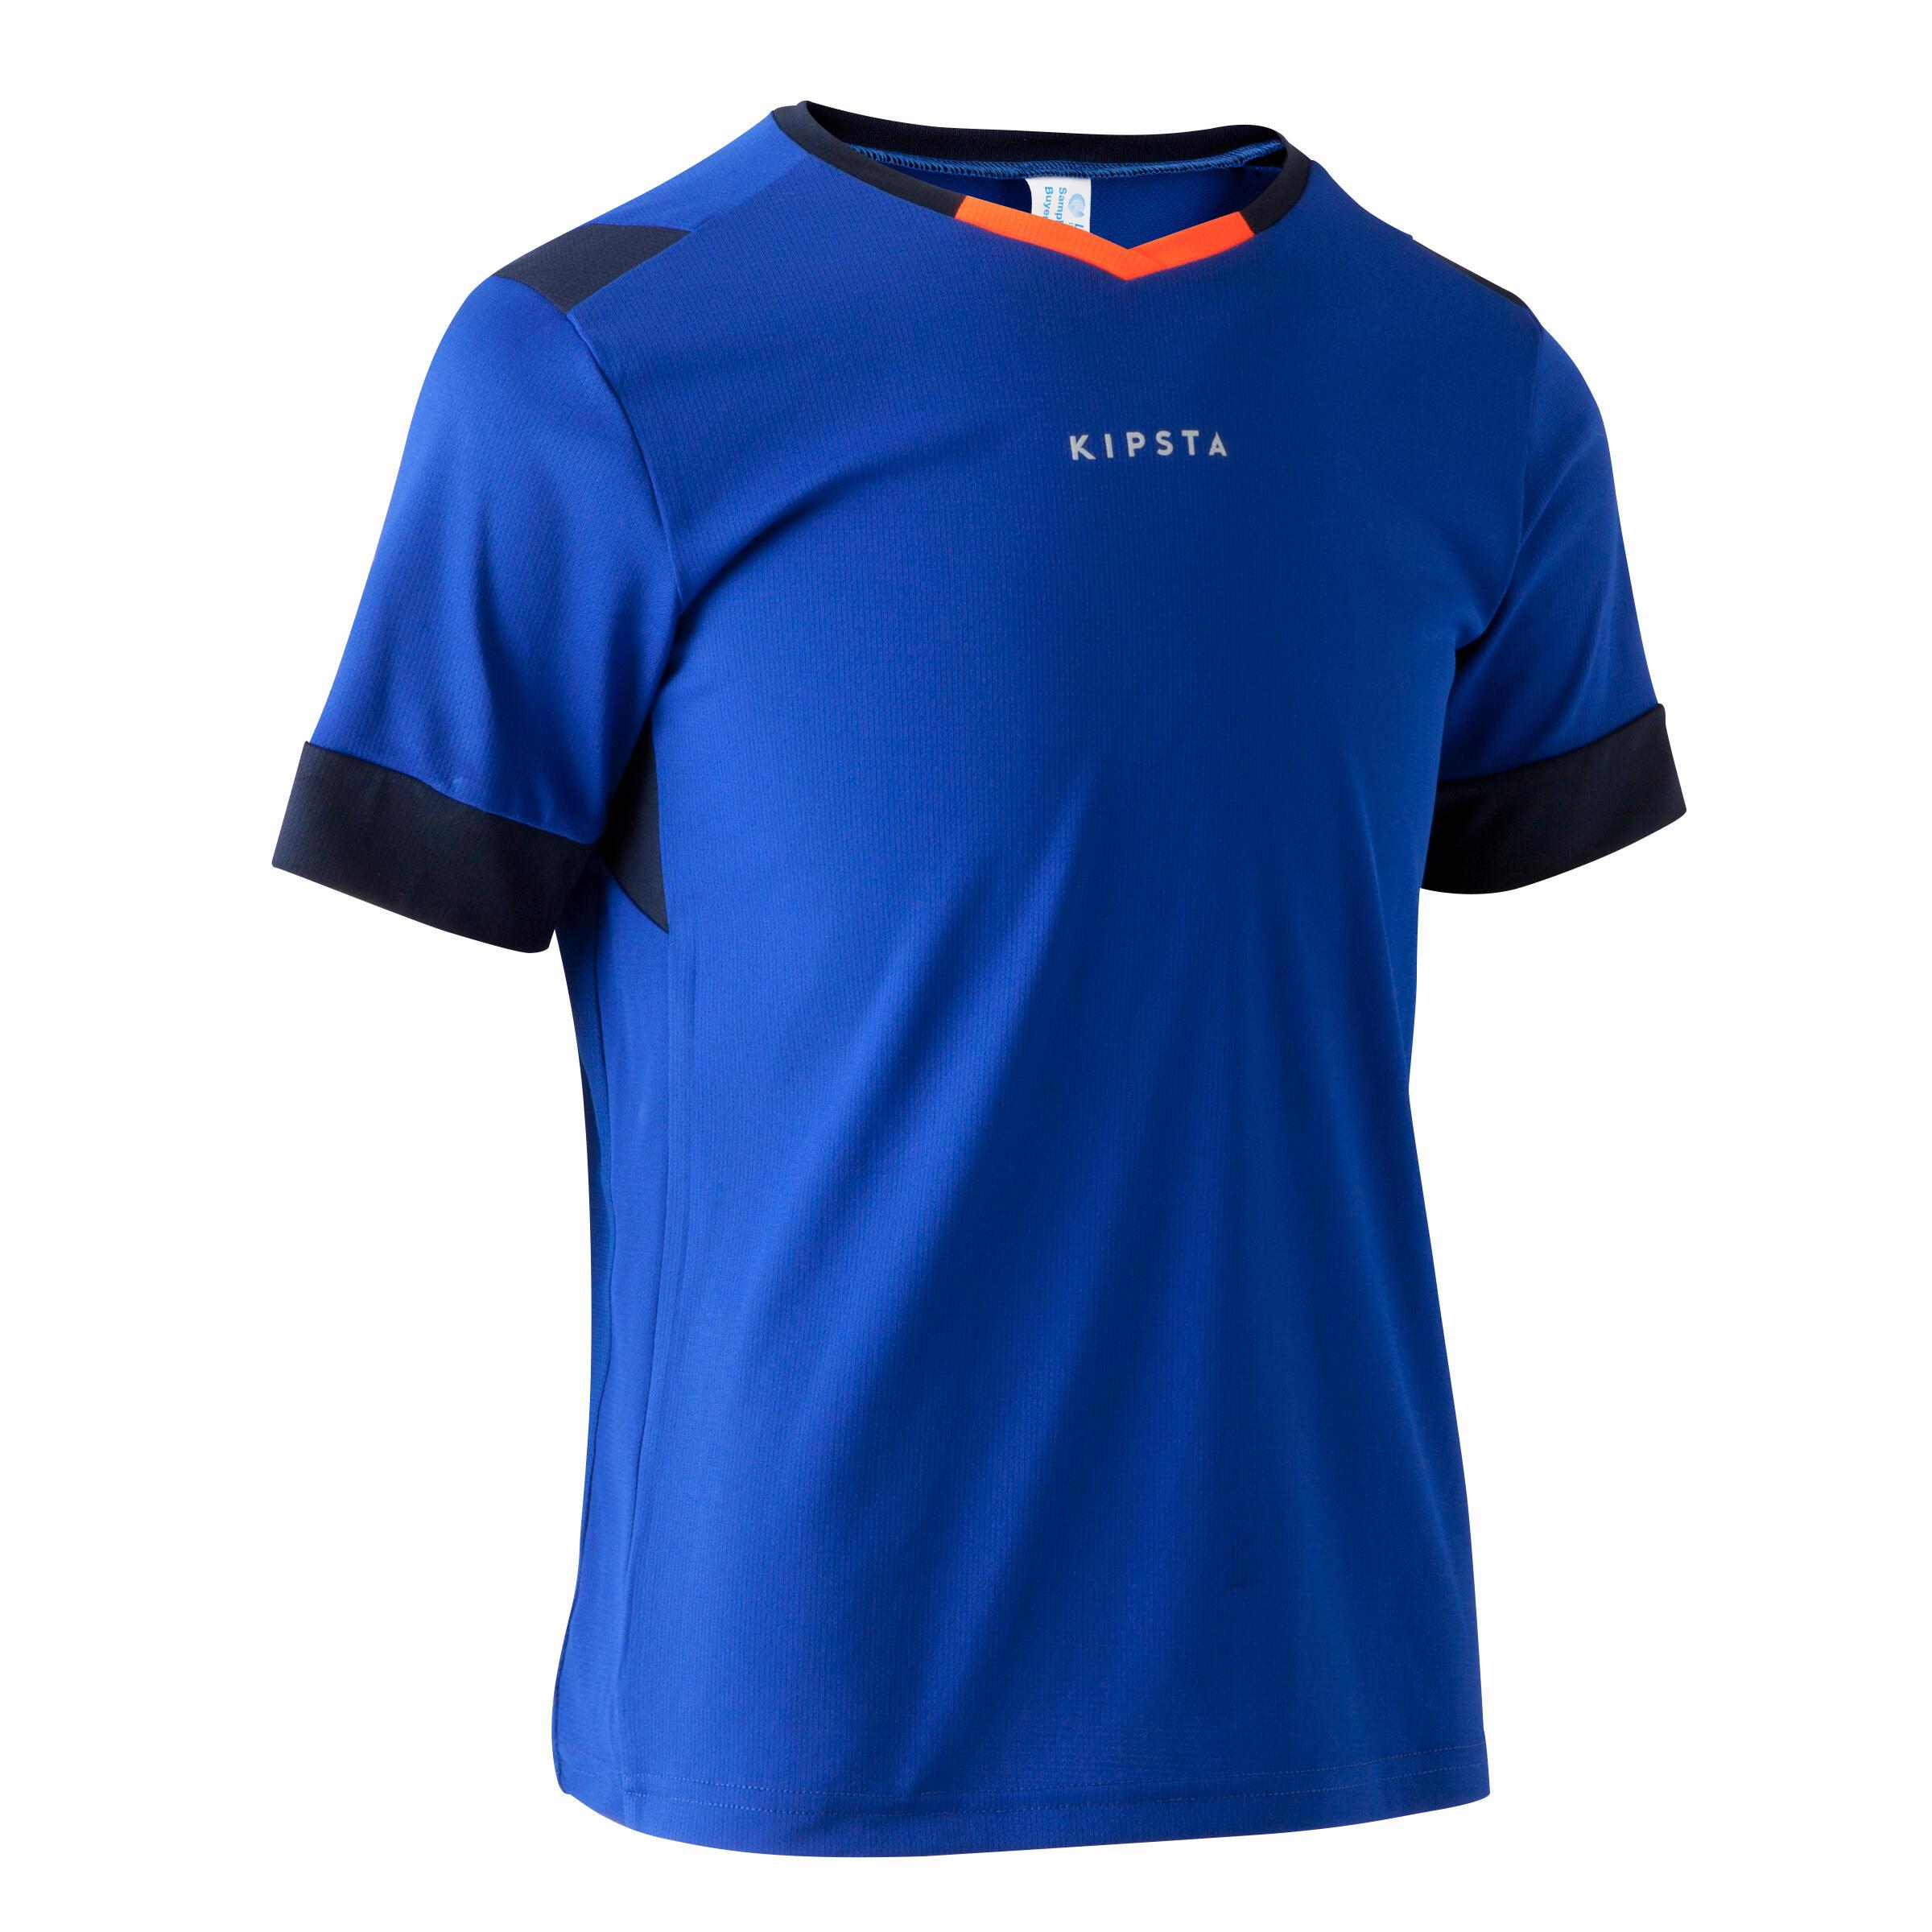 Kipsta Voetbalshirt kind F500 blauw